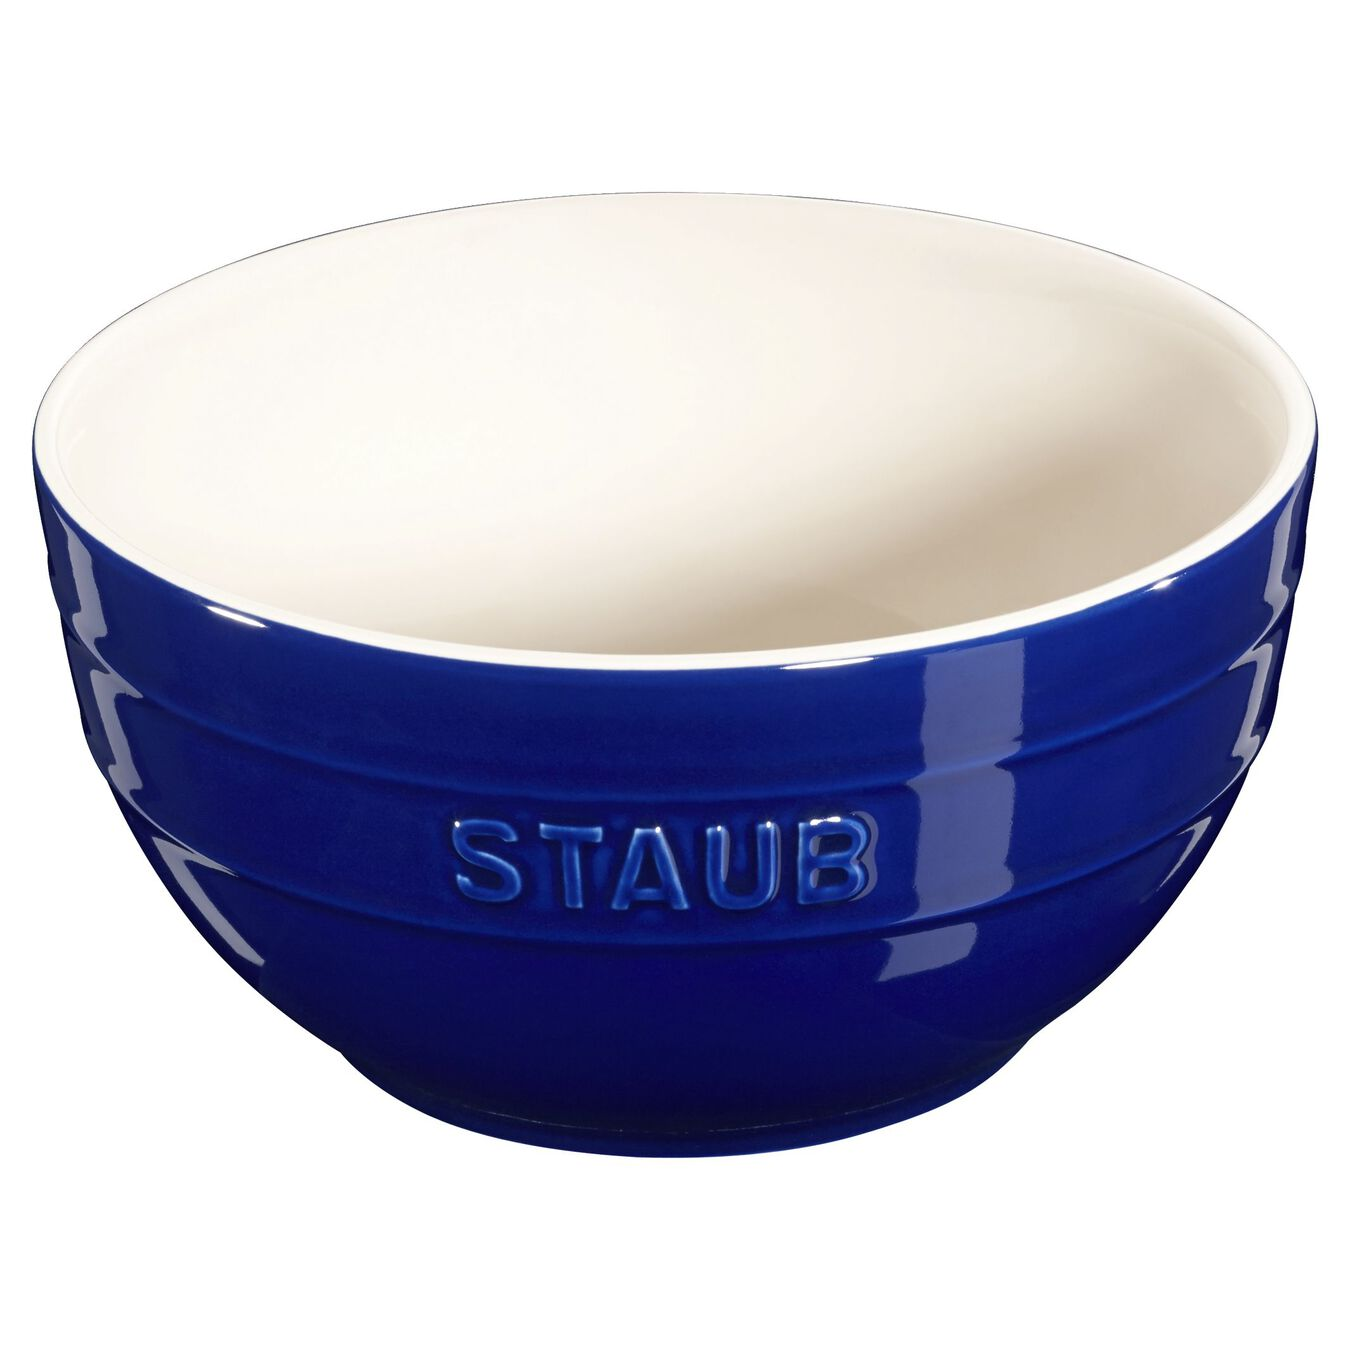 6.5-inch, Large Universal Bowl, dark blue,,large 1